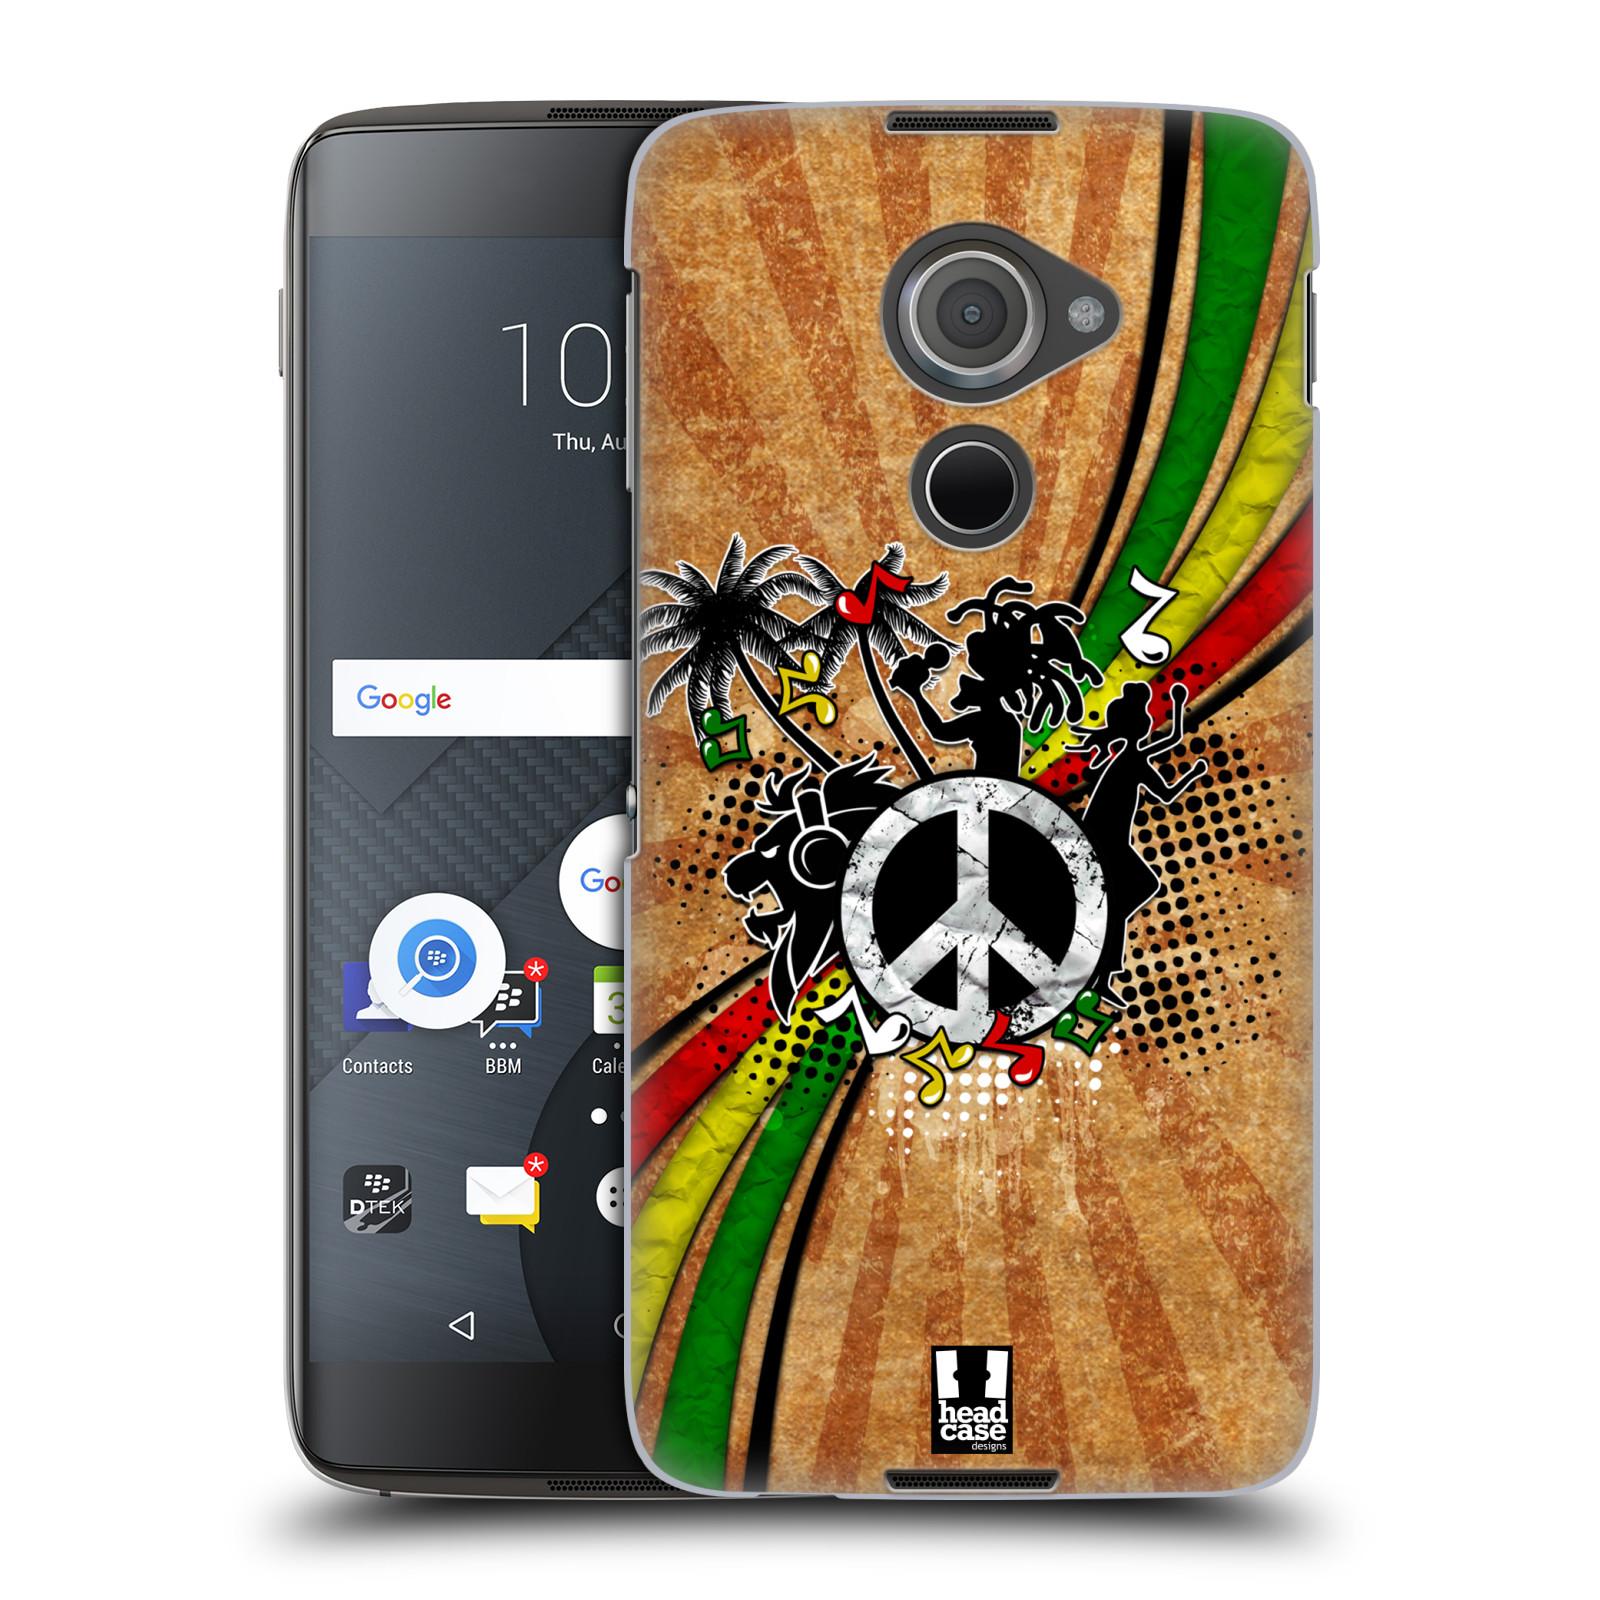 Plastové pouzdro na mobil Blackberry DTEK60 (Argon) - Head Case REGGAE (Plastový kryt či obal na mobilní telefon Blackberry DTEK60 (Argon))